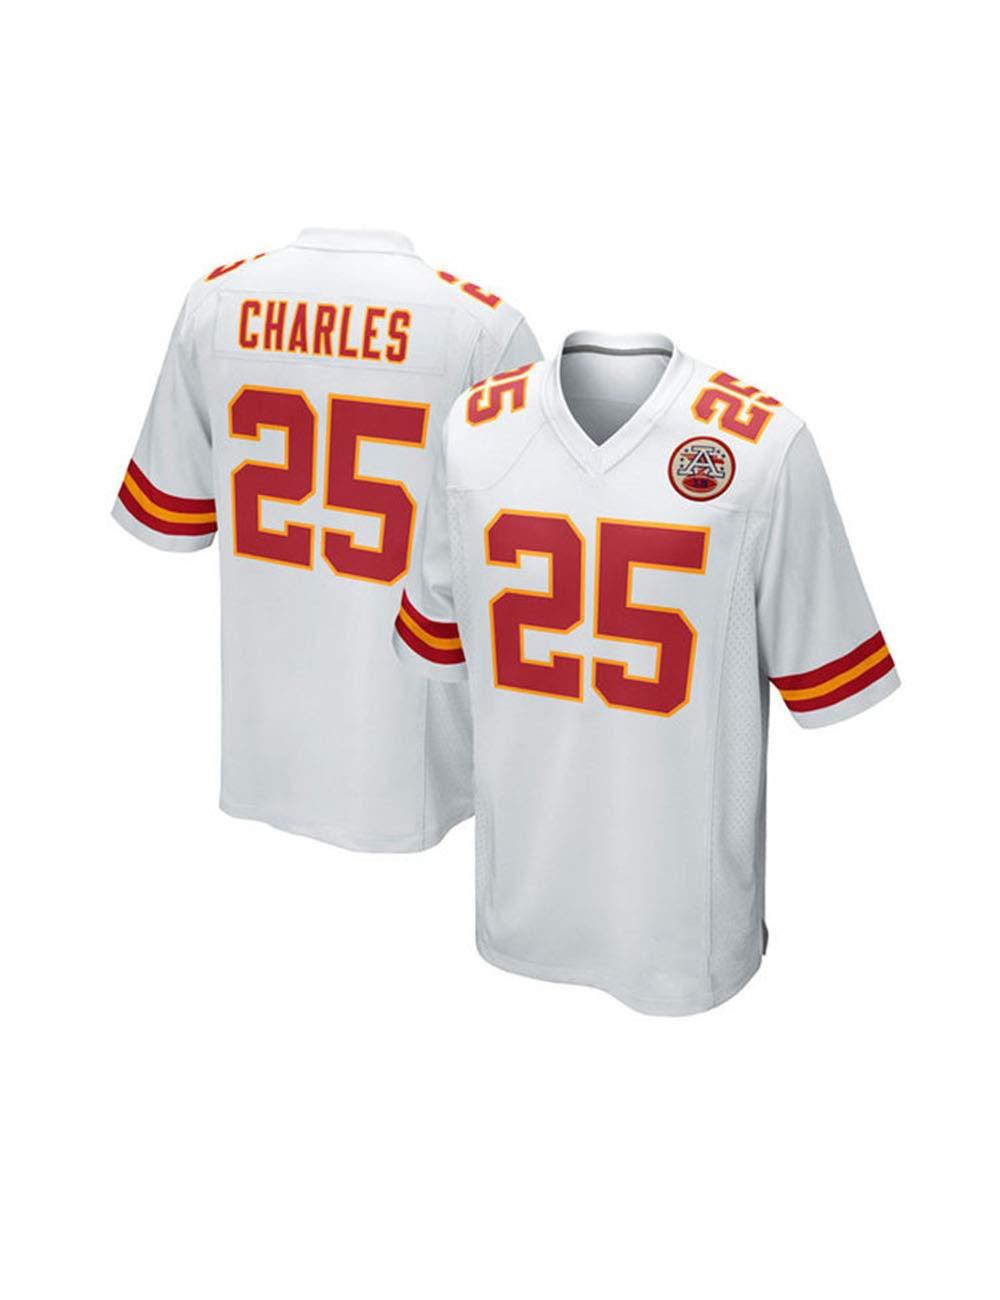 Chiefs # 15 Mahomes # 87# 10 Fu/ßballbekleidung Sport Top T-Shirt YMXBK Herren Trikot